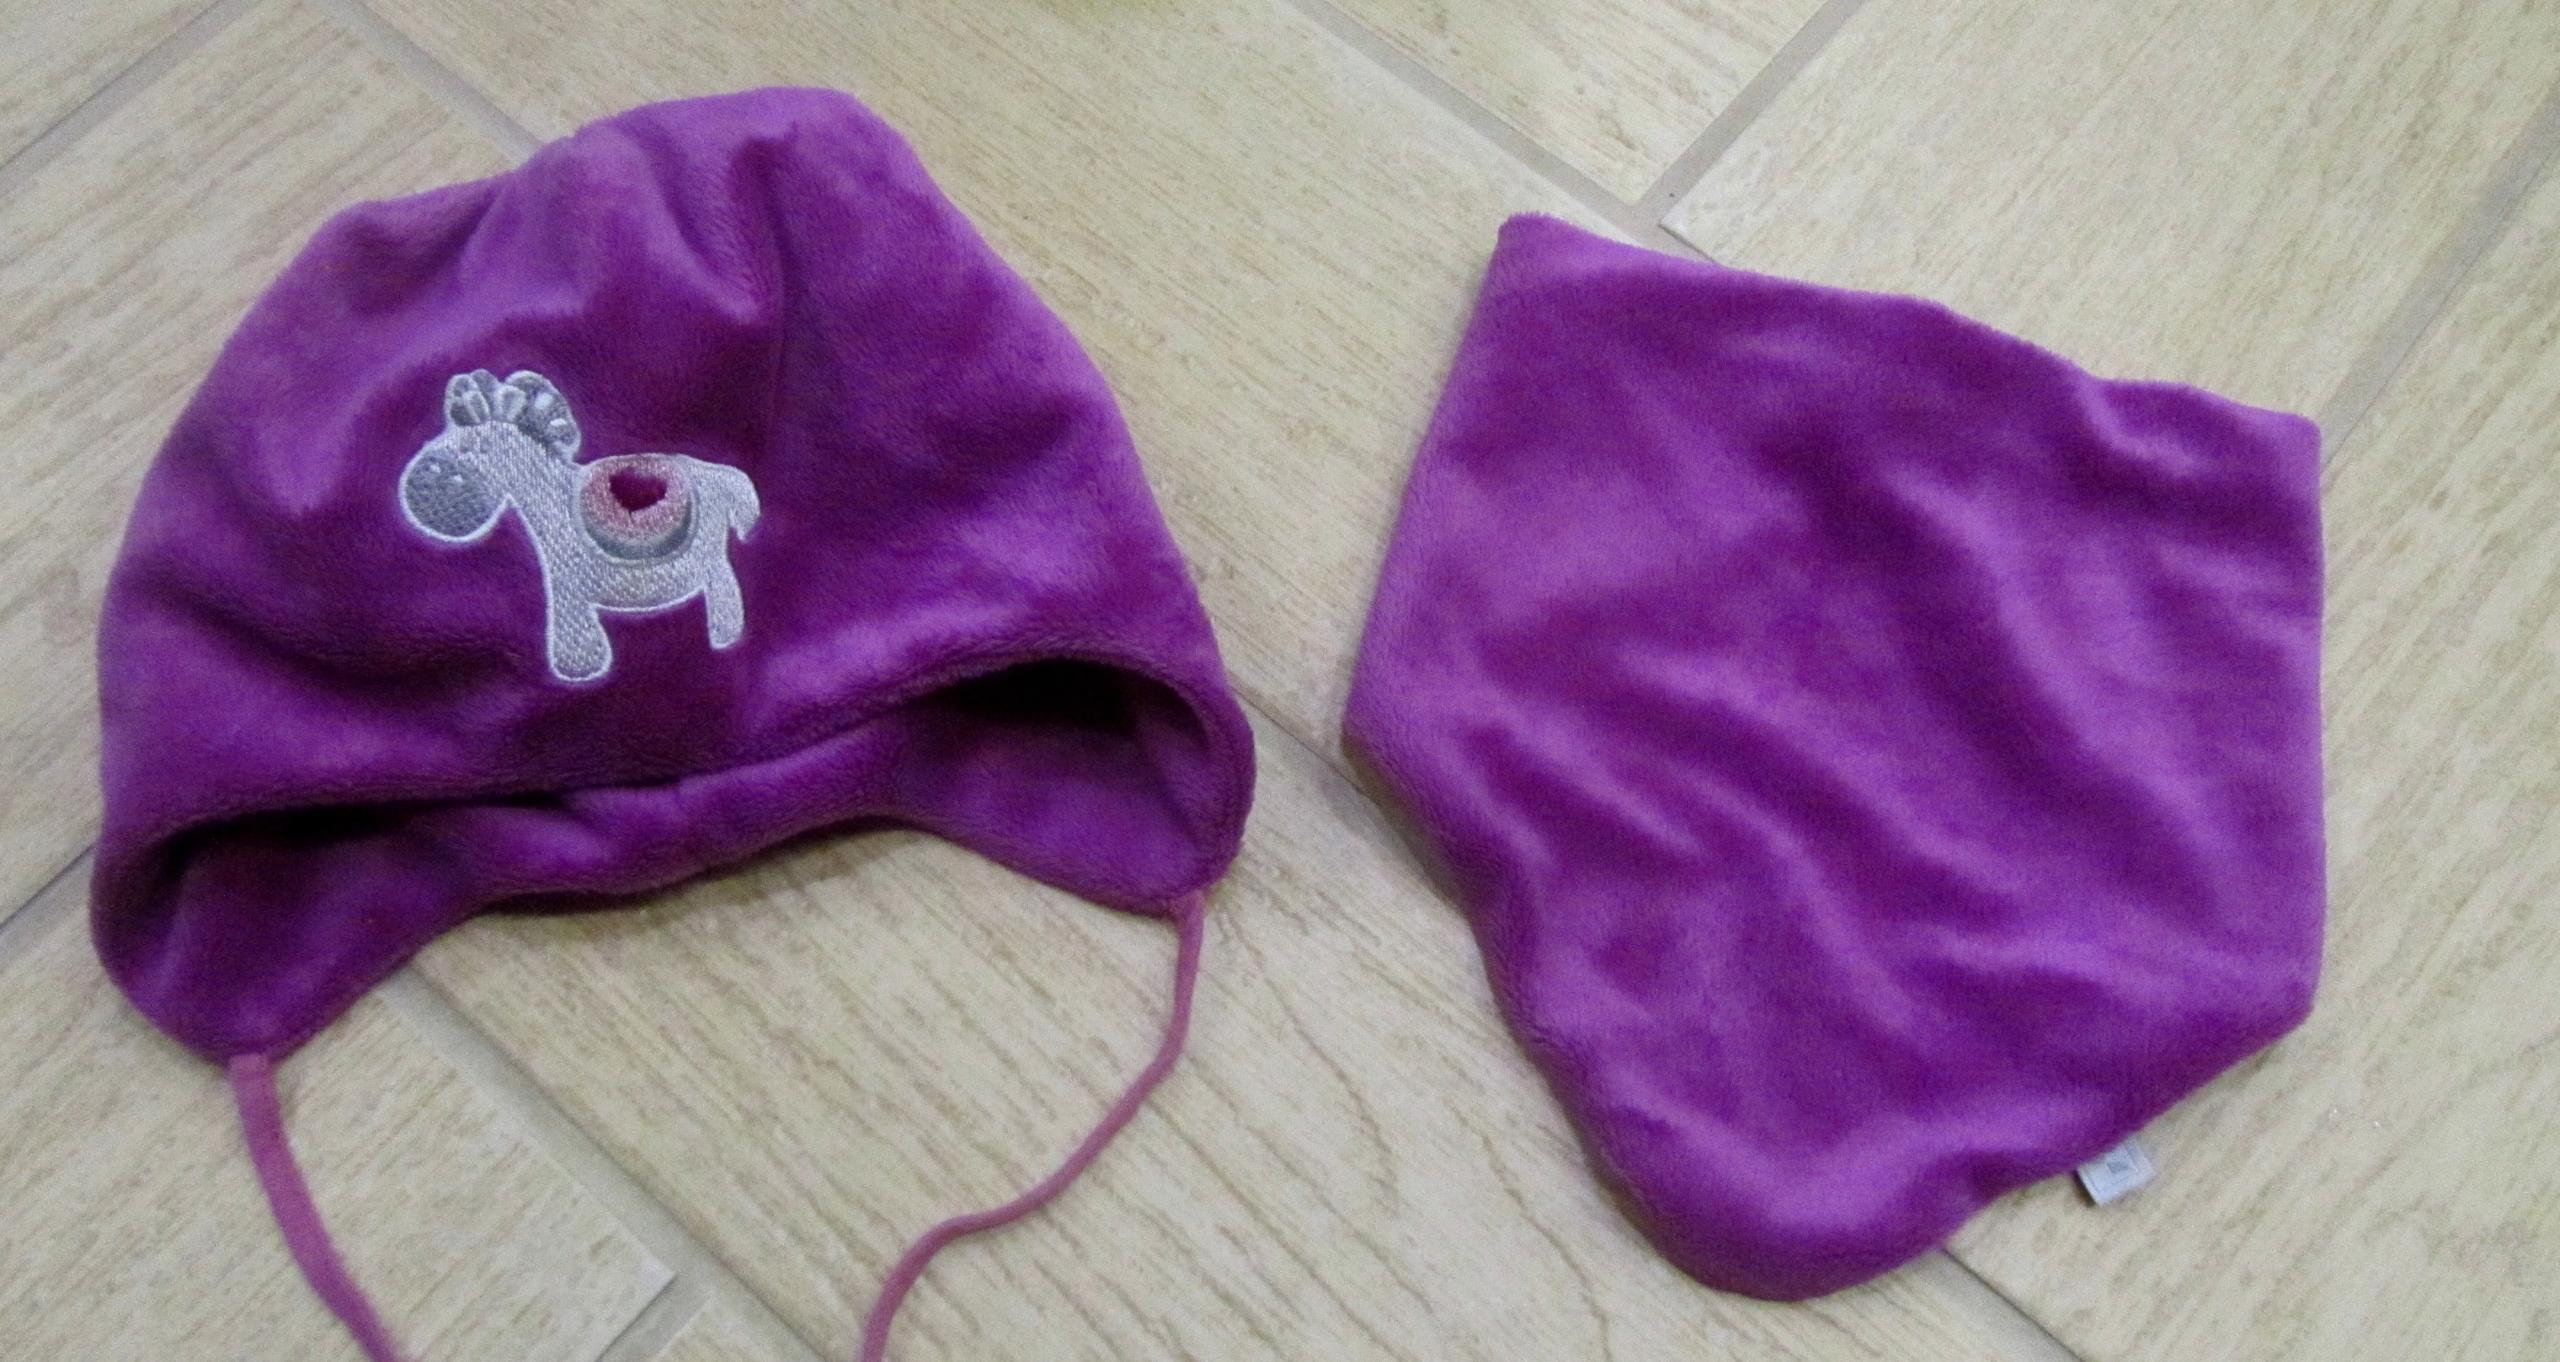 Fioletowy kpl czapka chusta Coccodrillo 50